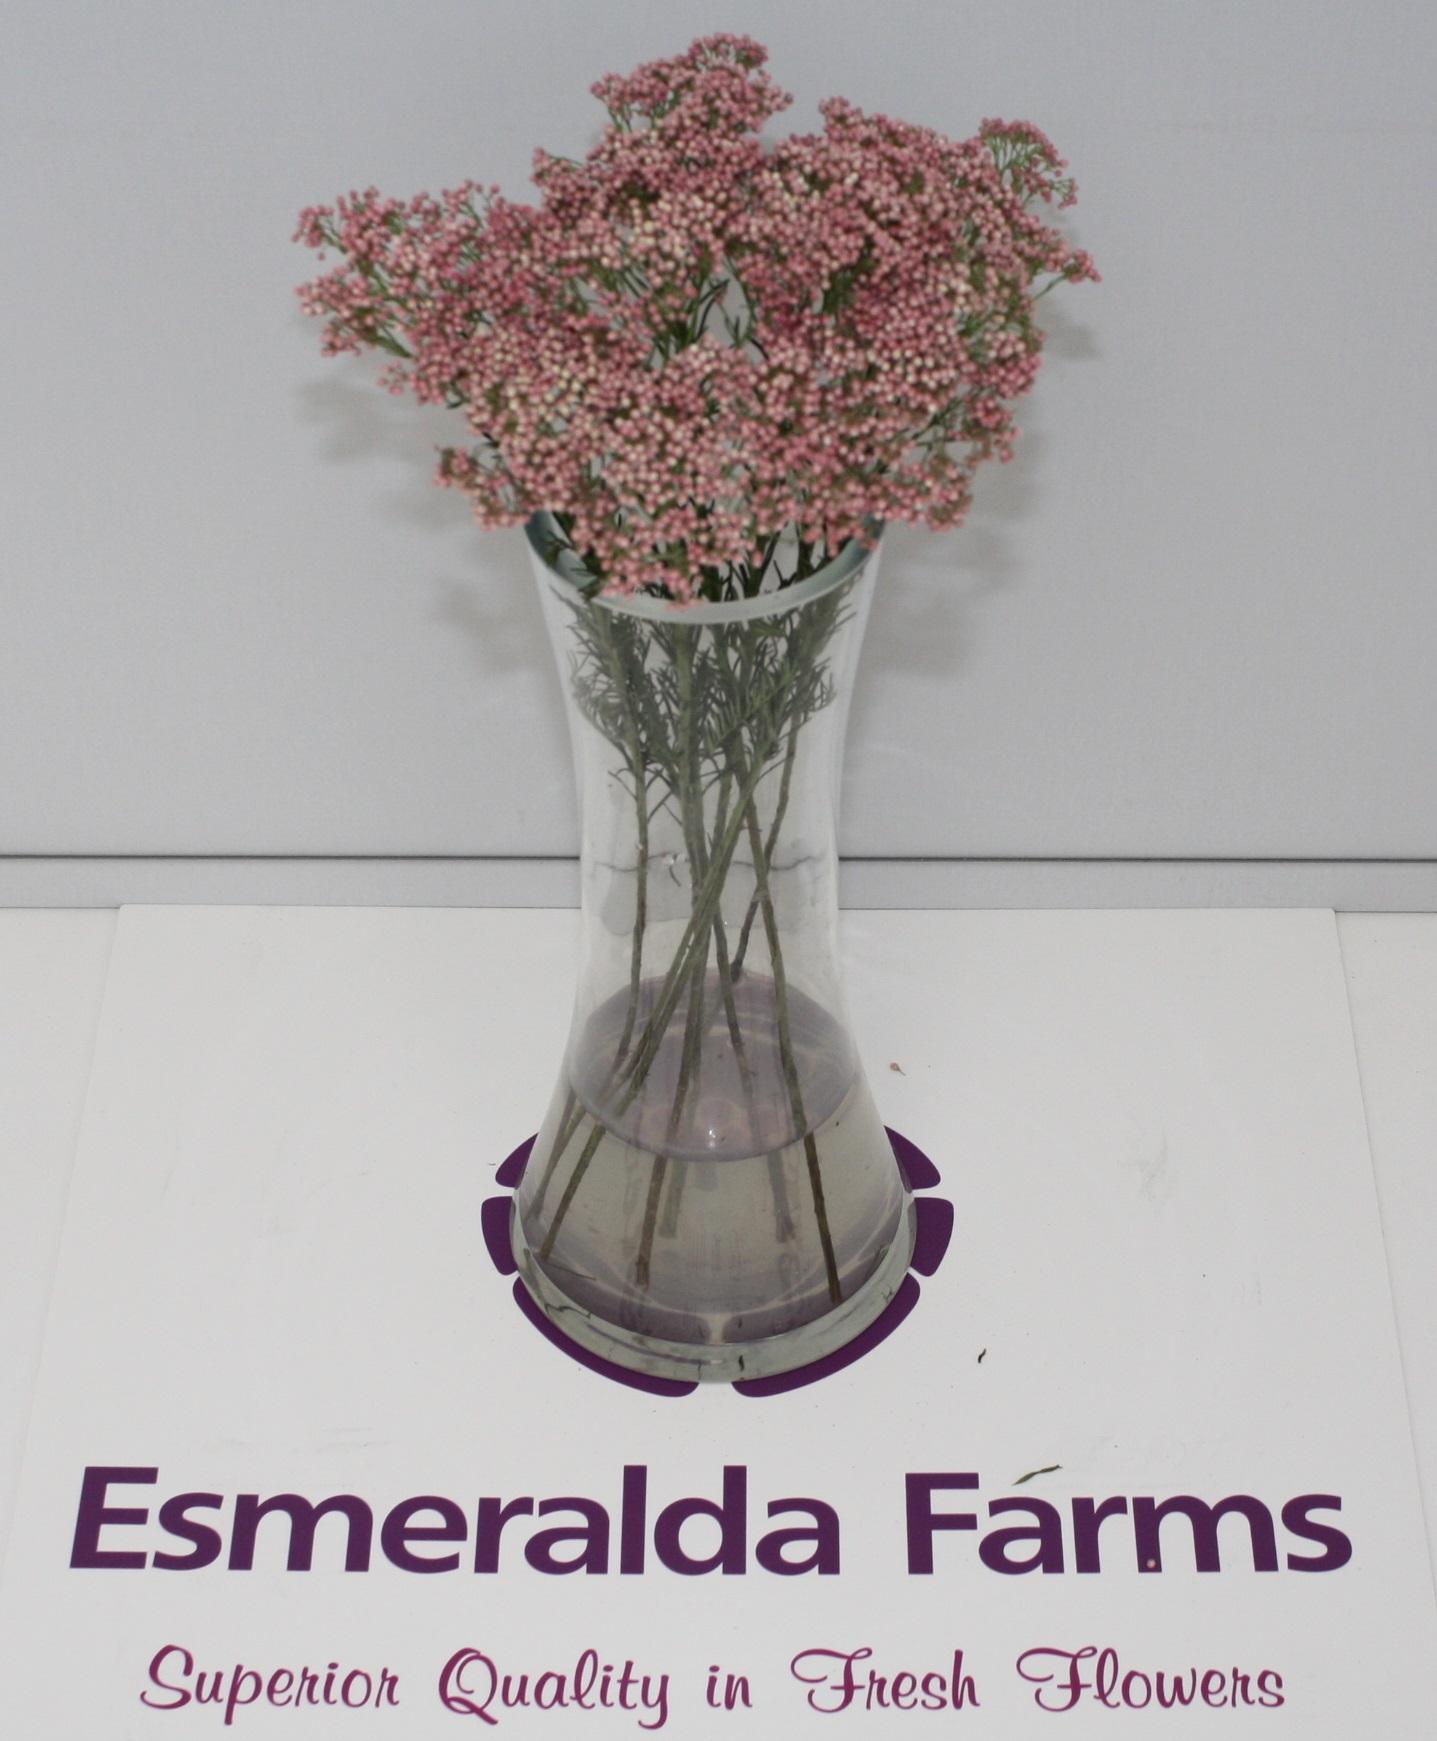 Meet our partner esmeralda farms world class mightylinksfo